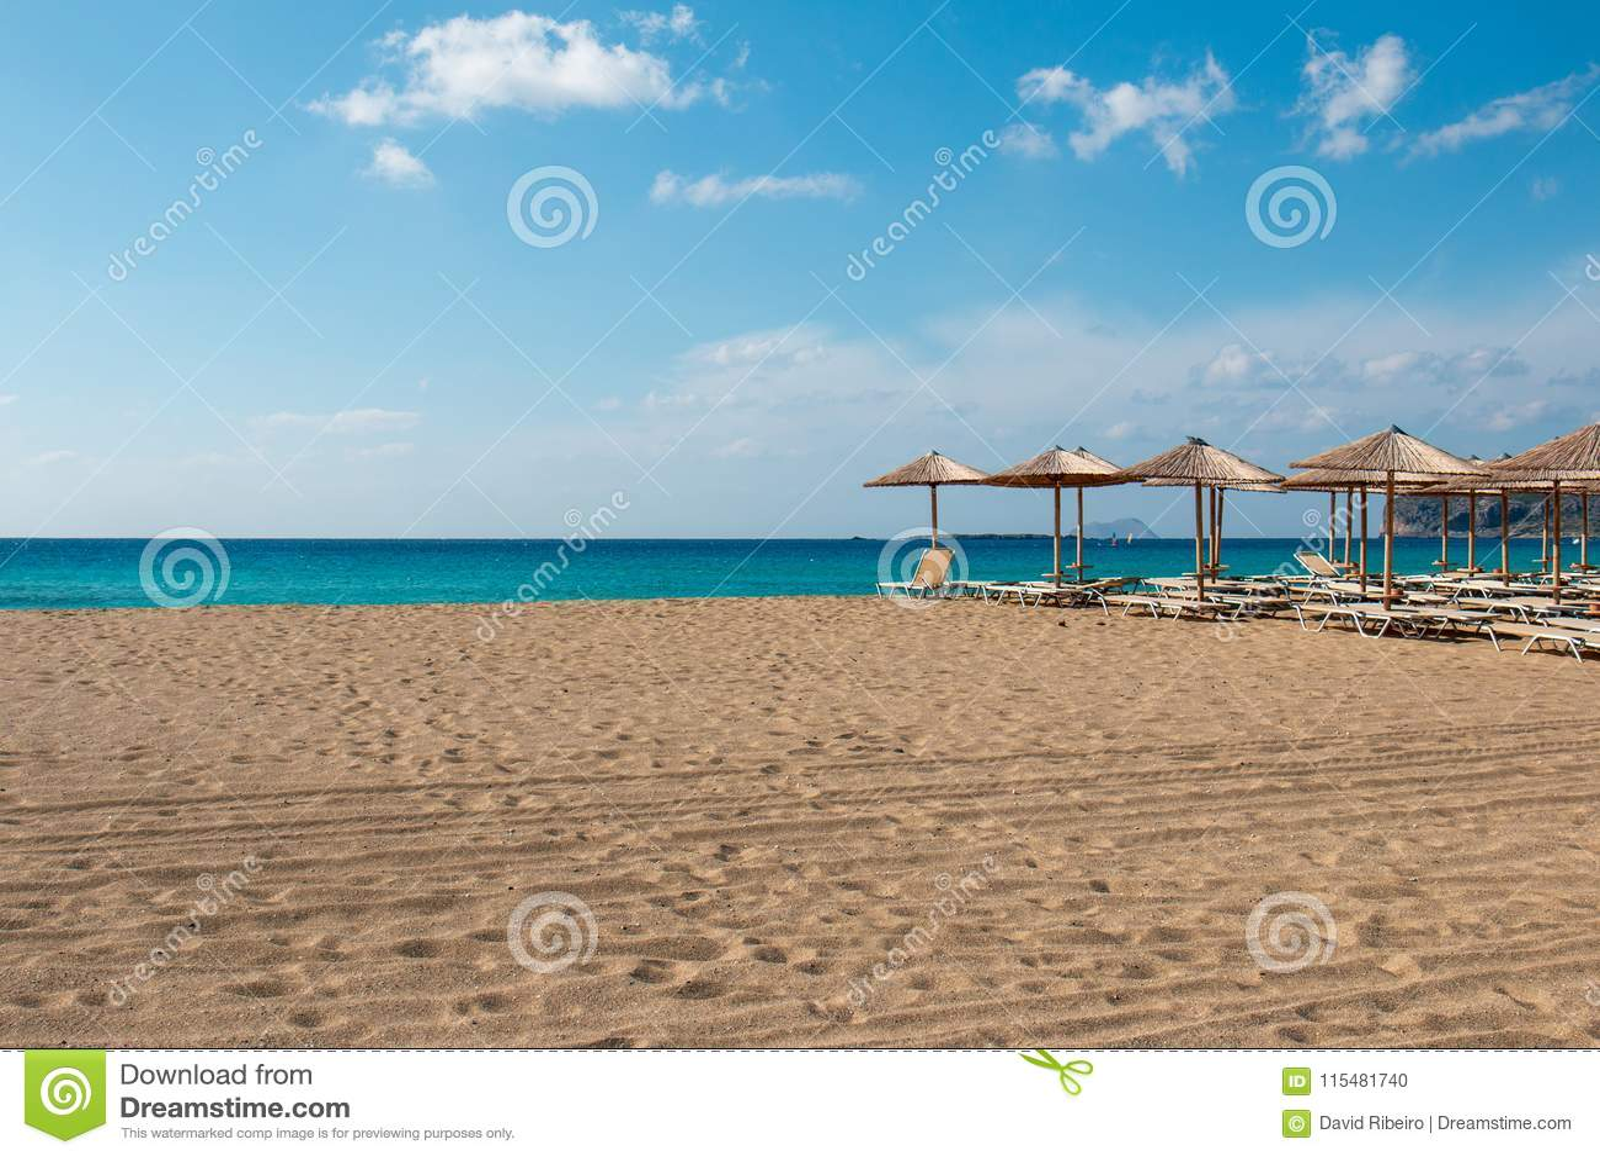 Strand sunbeds en parasols overziend turkoois water in Griekenland